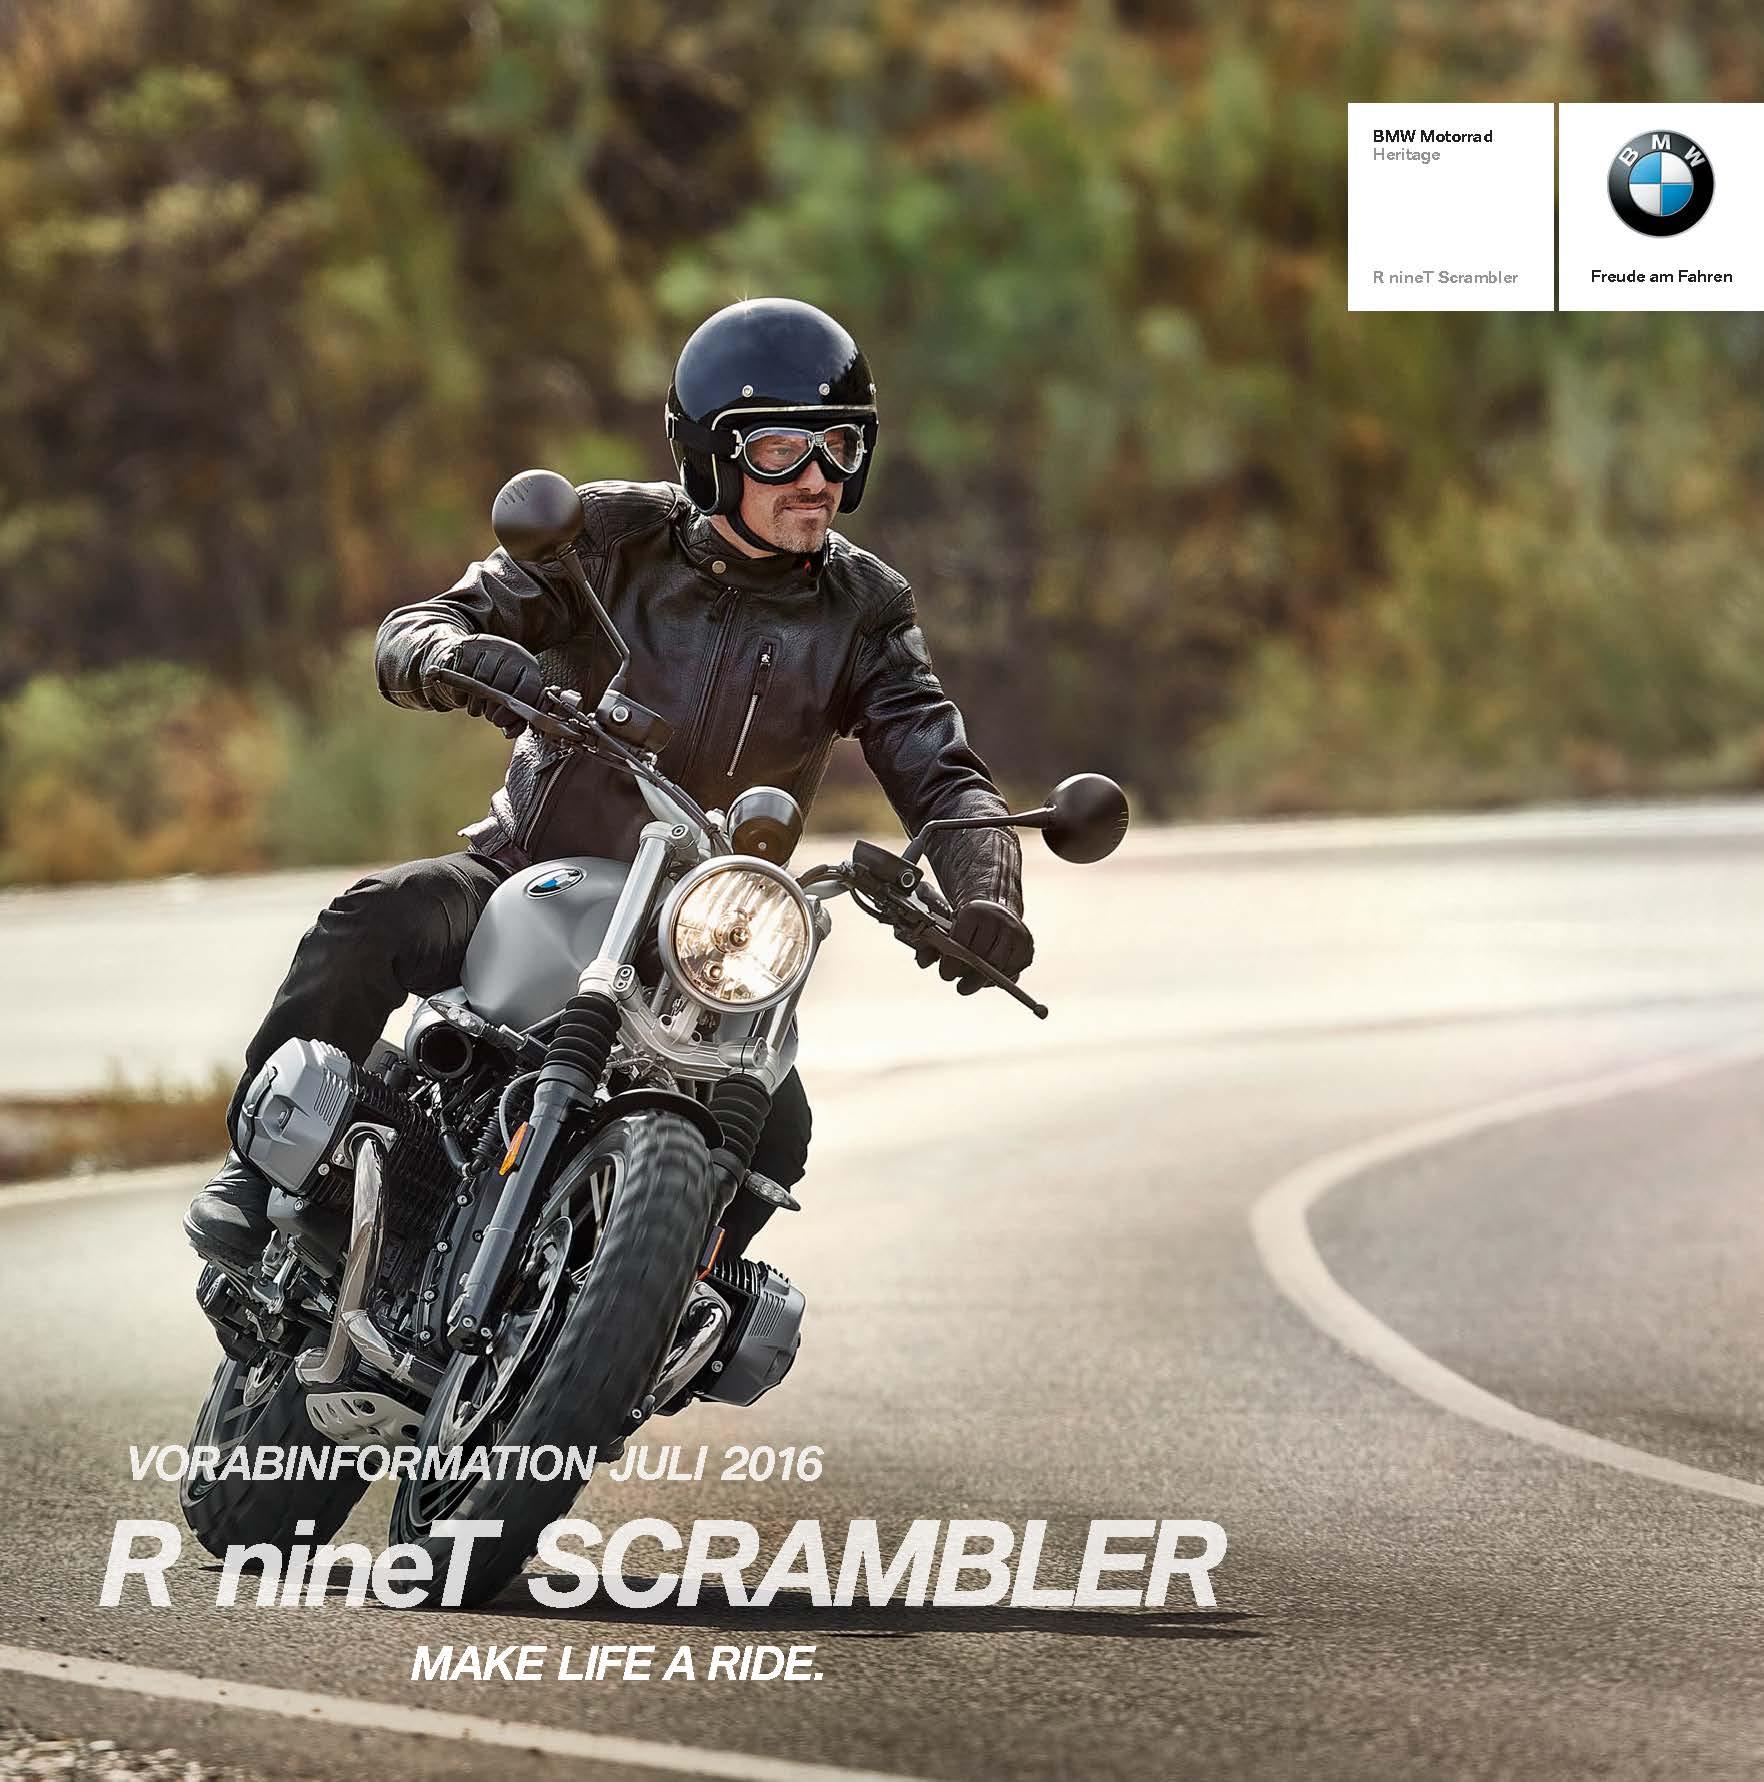 download_preisblatt_rninet_scrambler_07-2016-www_24juni-1_seite_1.jpg